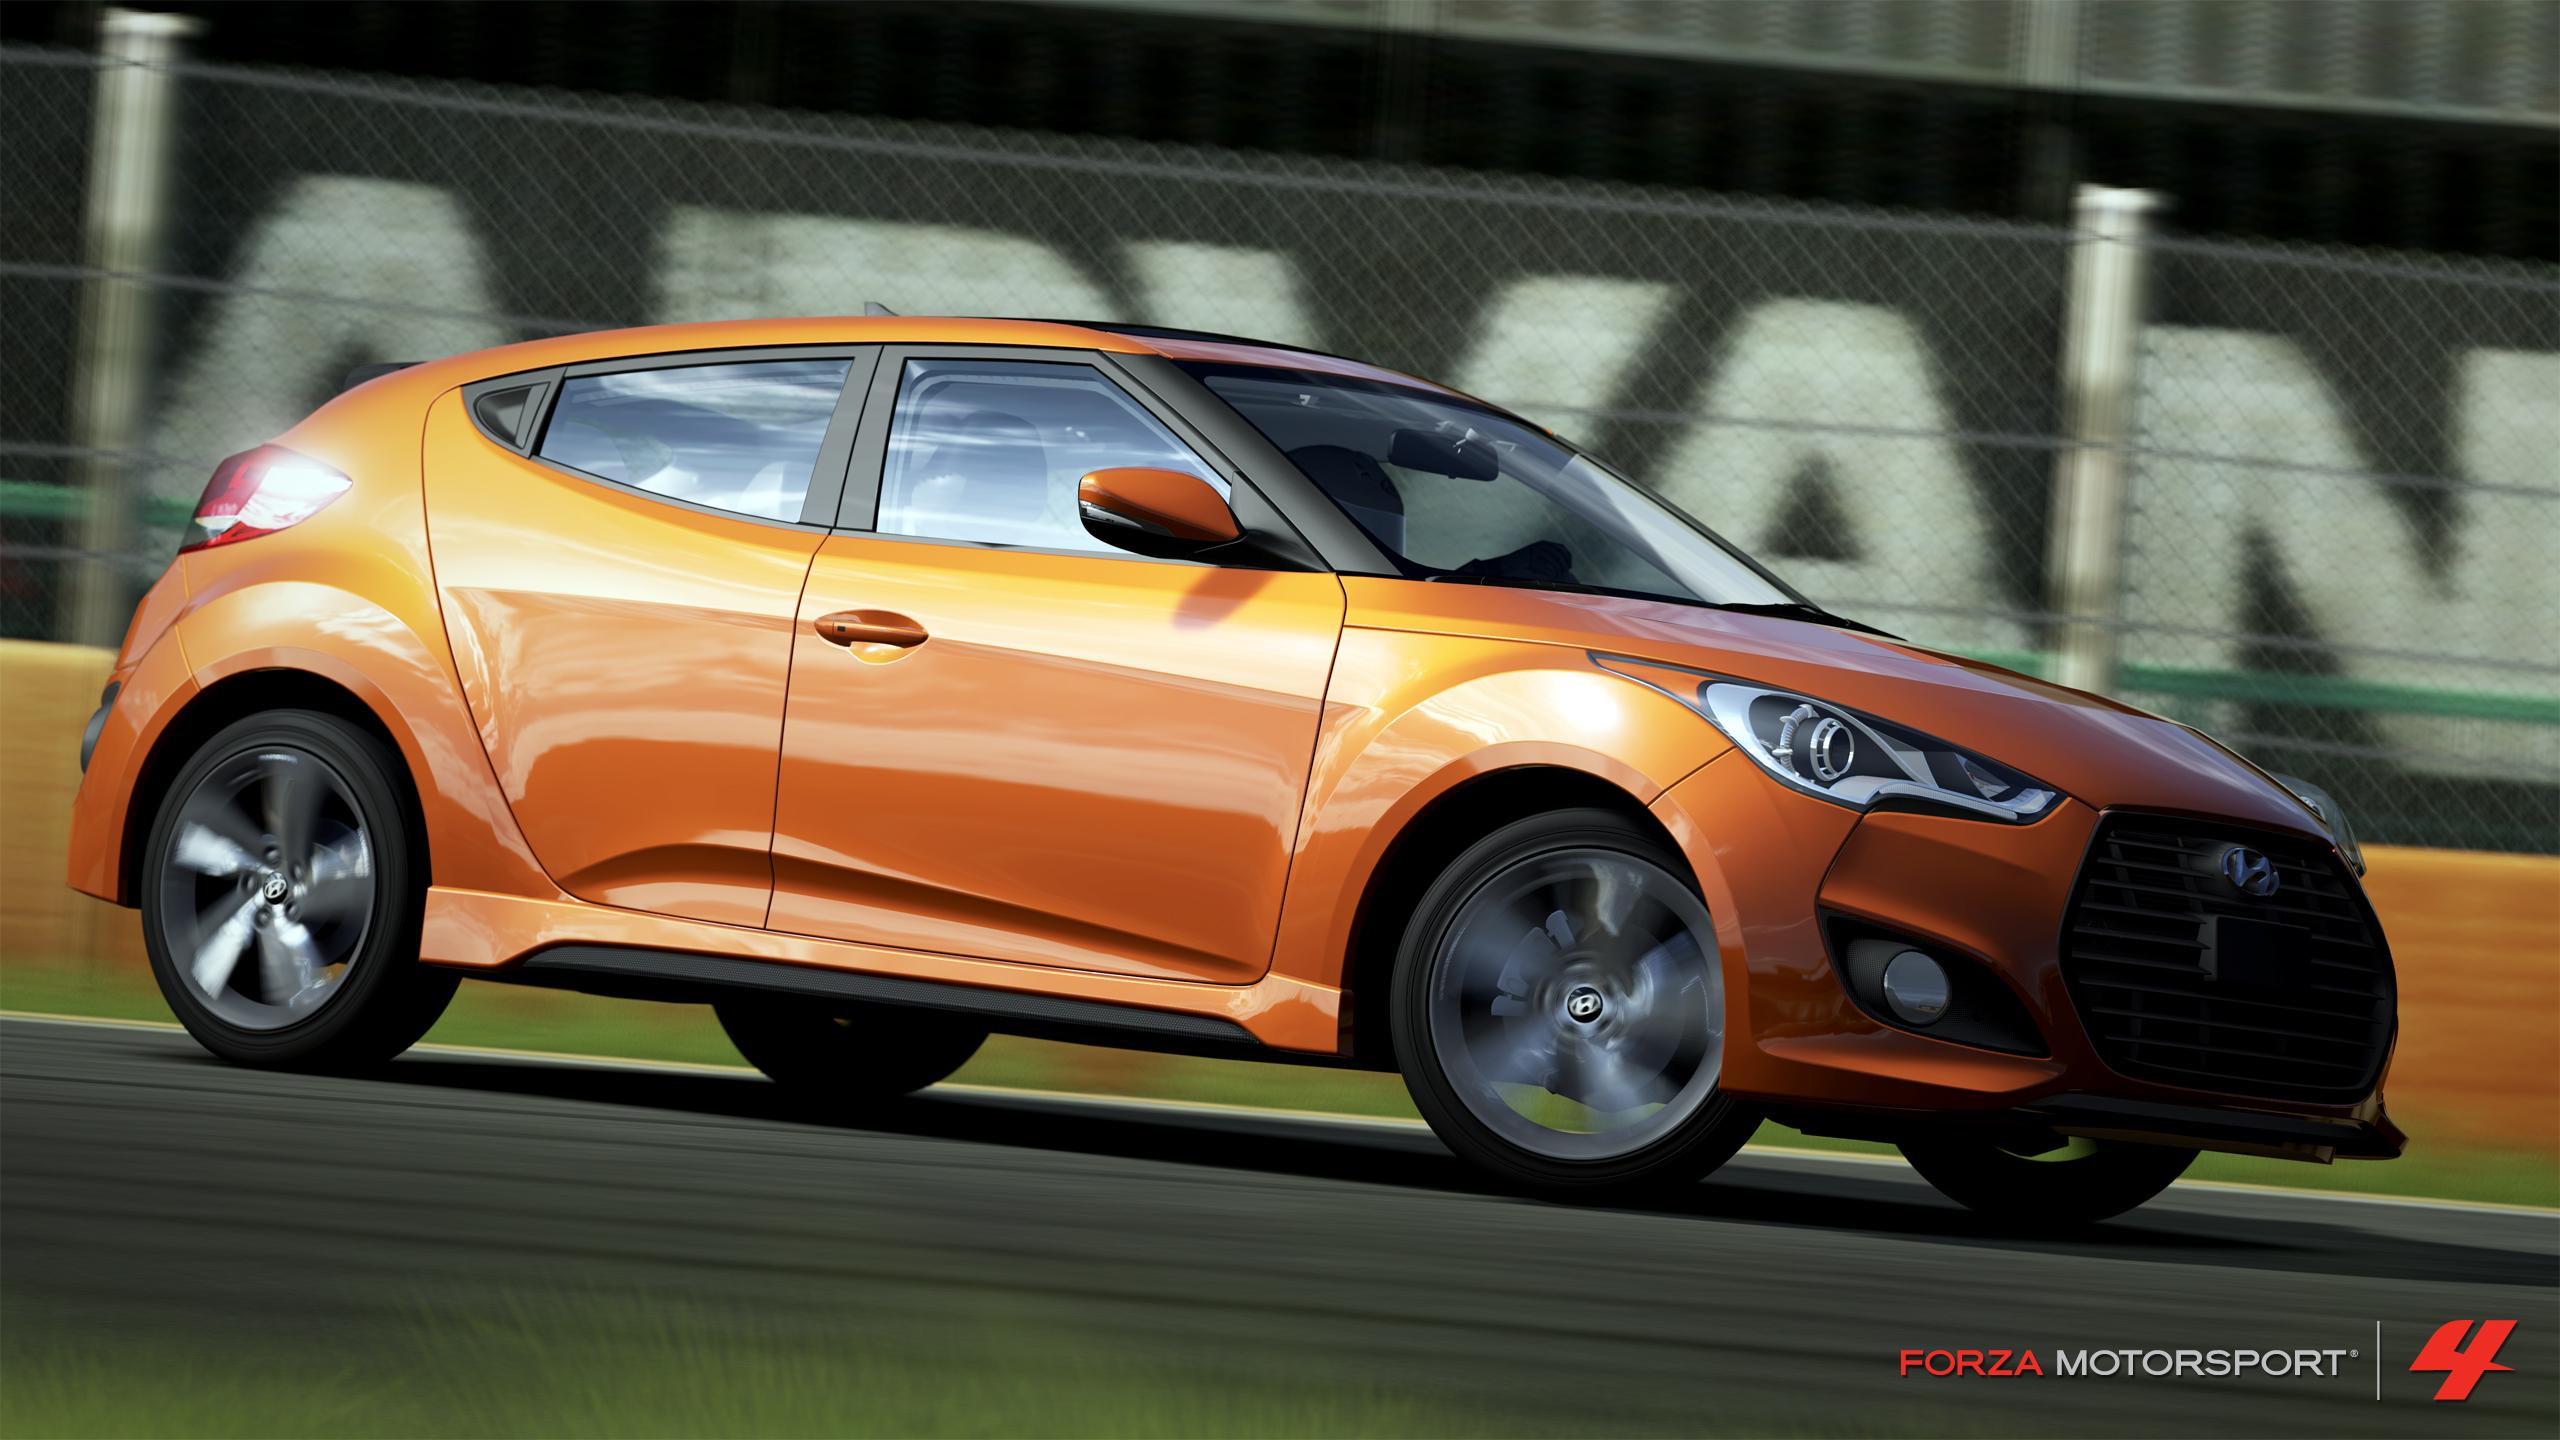 Forza Motorsport 4/Hyundai Veloster Bonus Pack